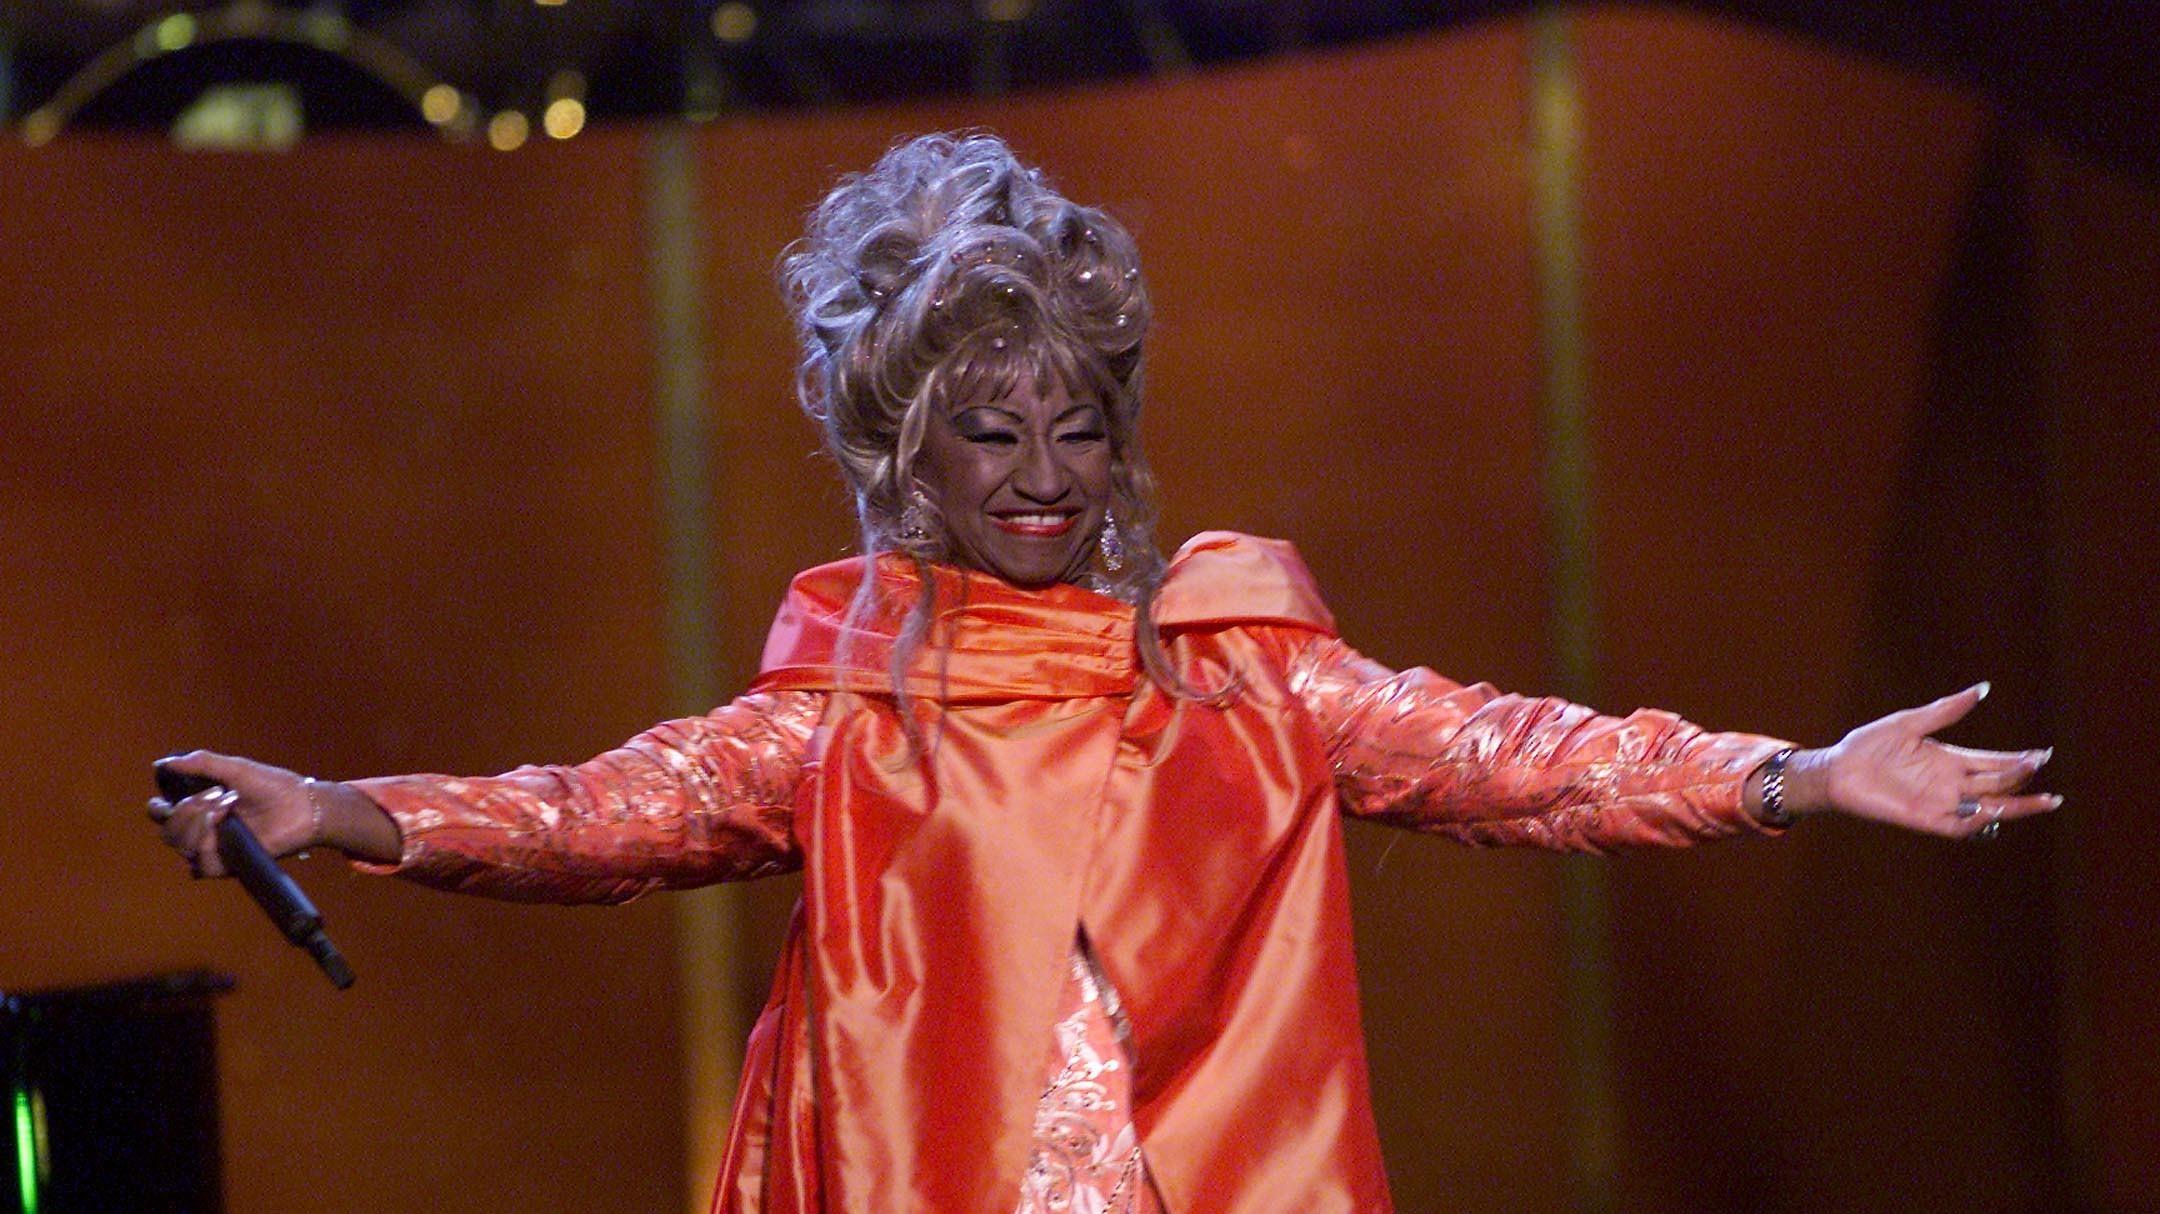 Celia Cruz's 'Son Con Guaguancó' And The Bridge To Fame In Exile